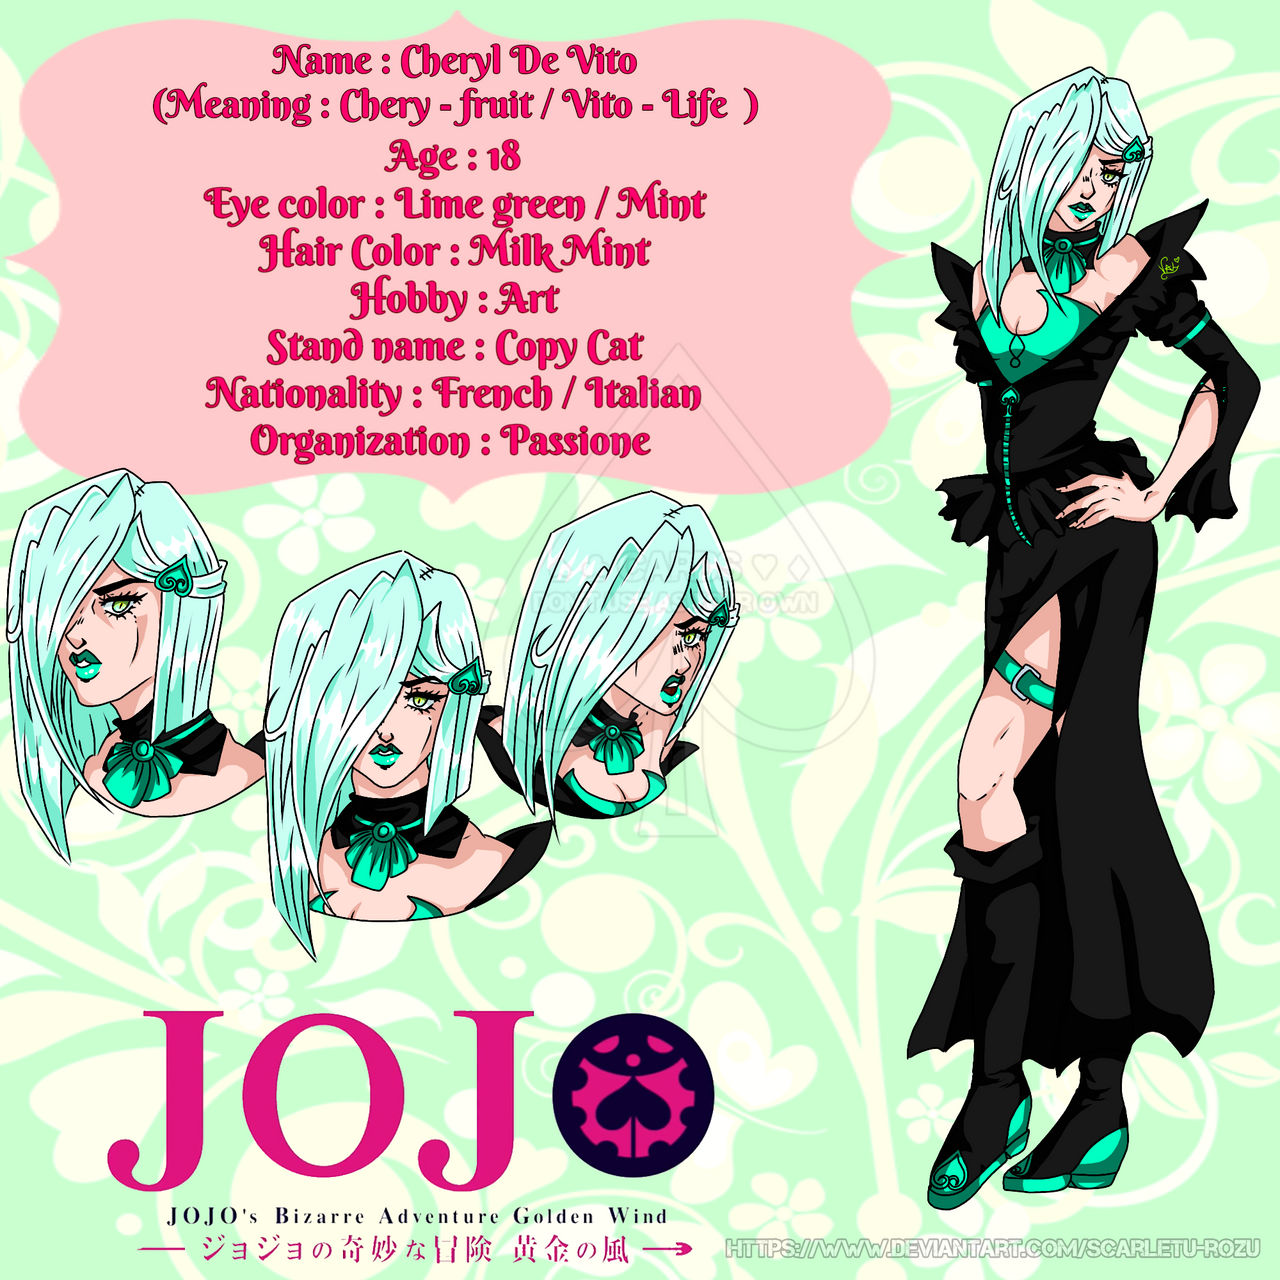 Cheryl De Vito ( JJBA Part 5 OC - About ) by Scarletu-Rozu on DeviantArt